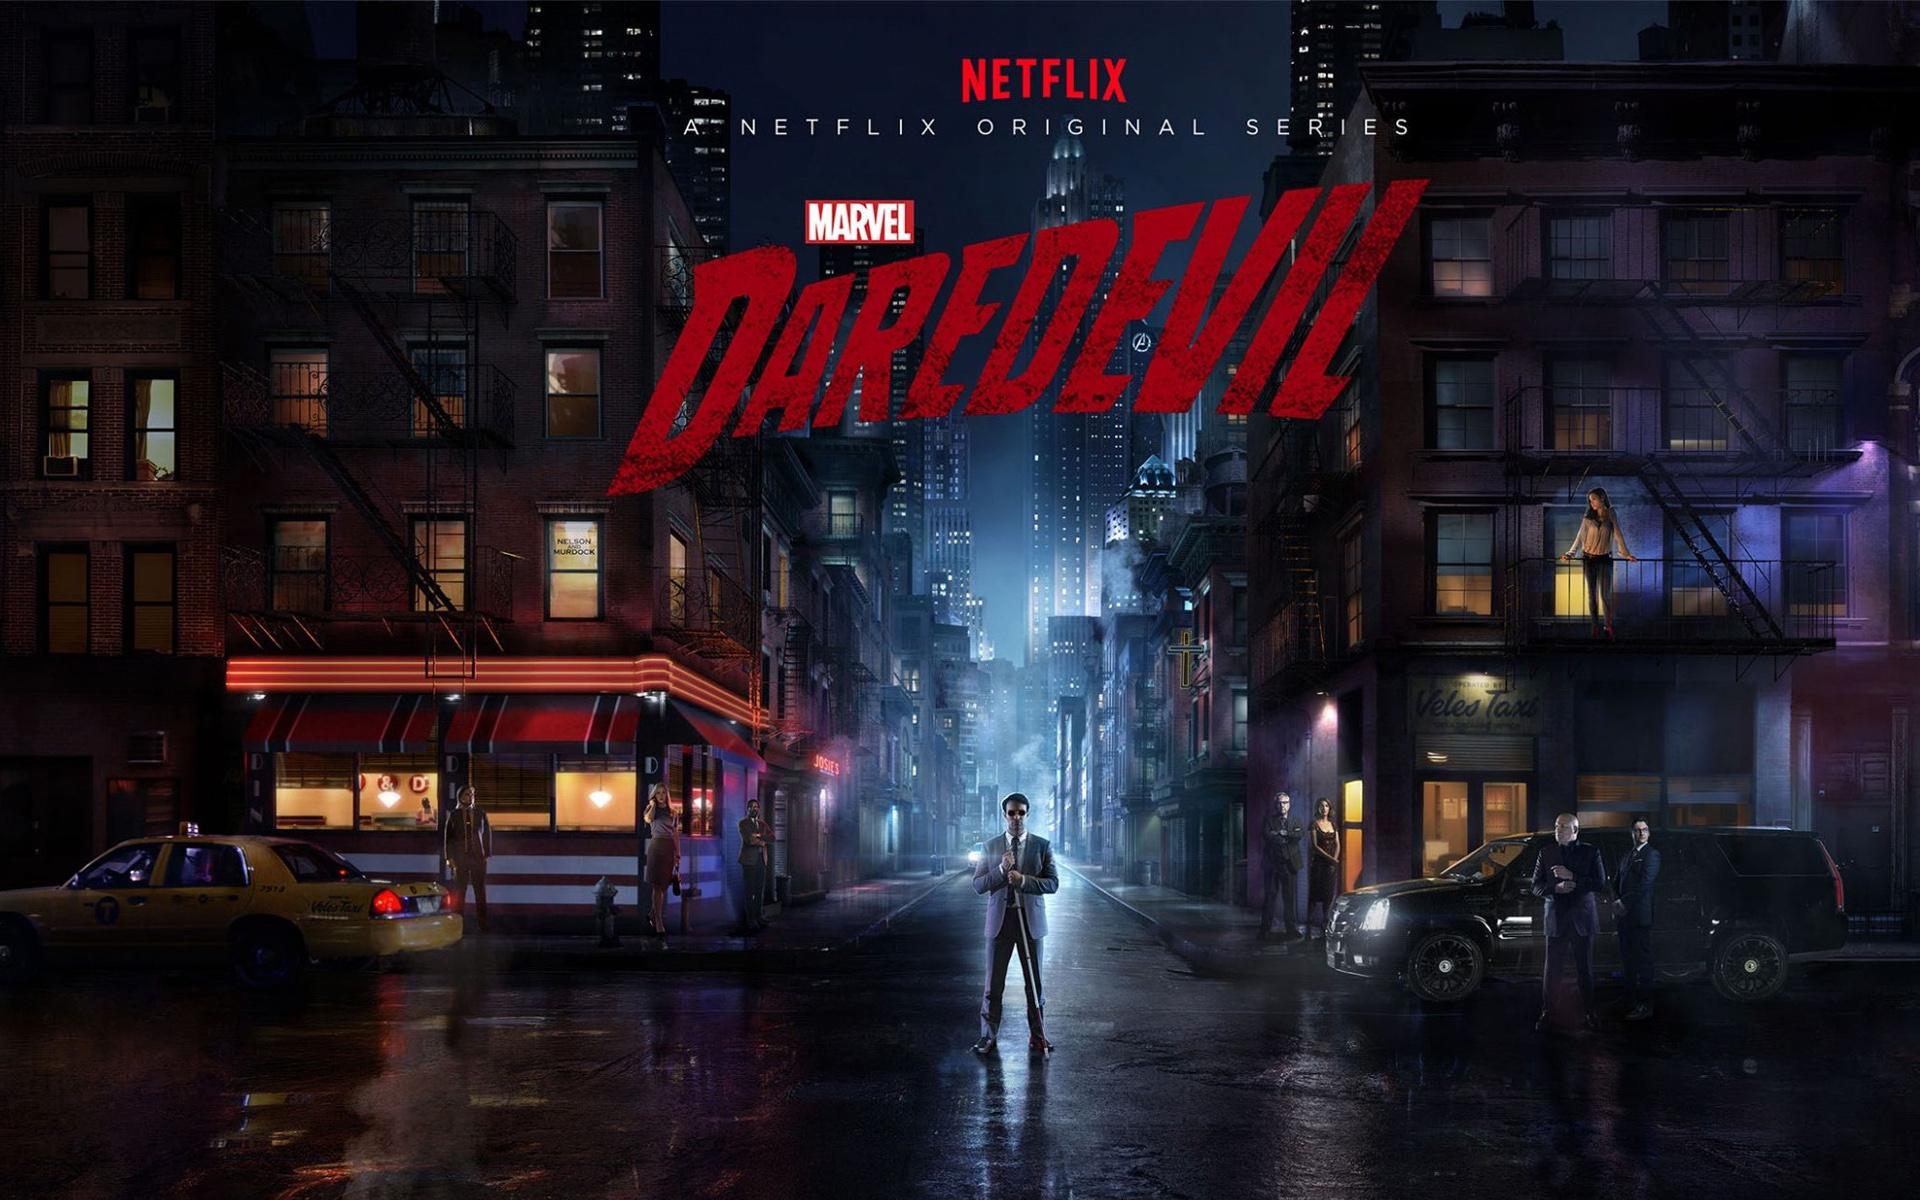 Source Luke Cage Netflix Iphone Wallpaper Enam Daredevil Series WallpaperSafari